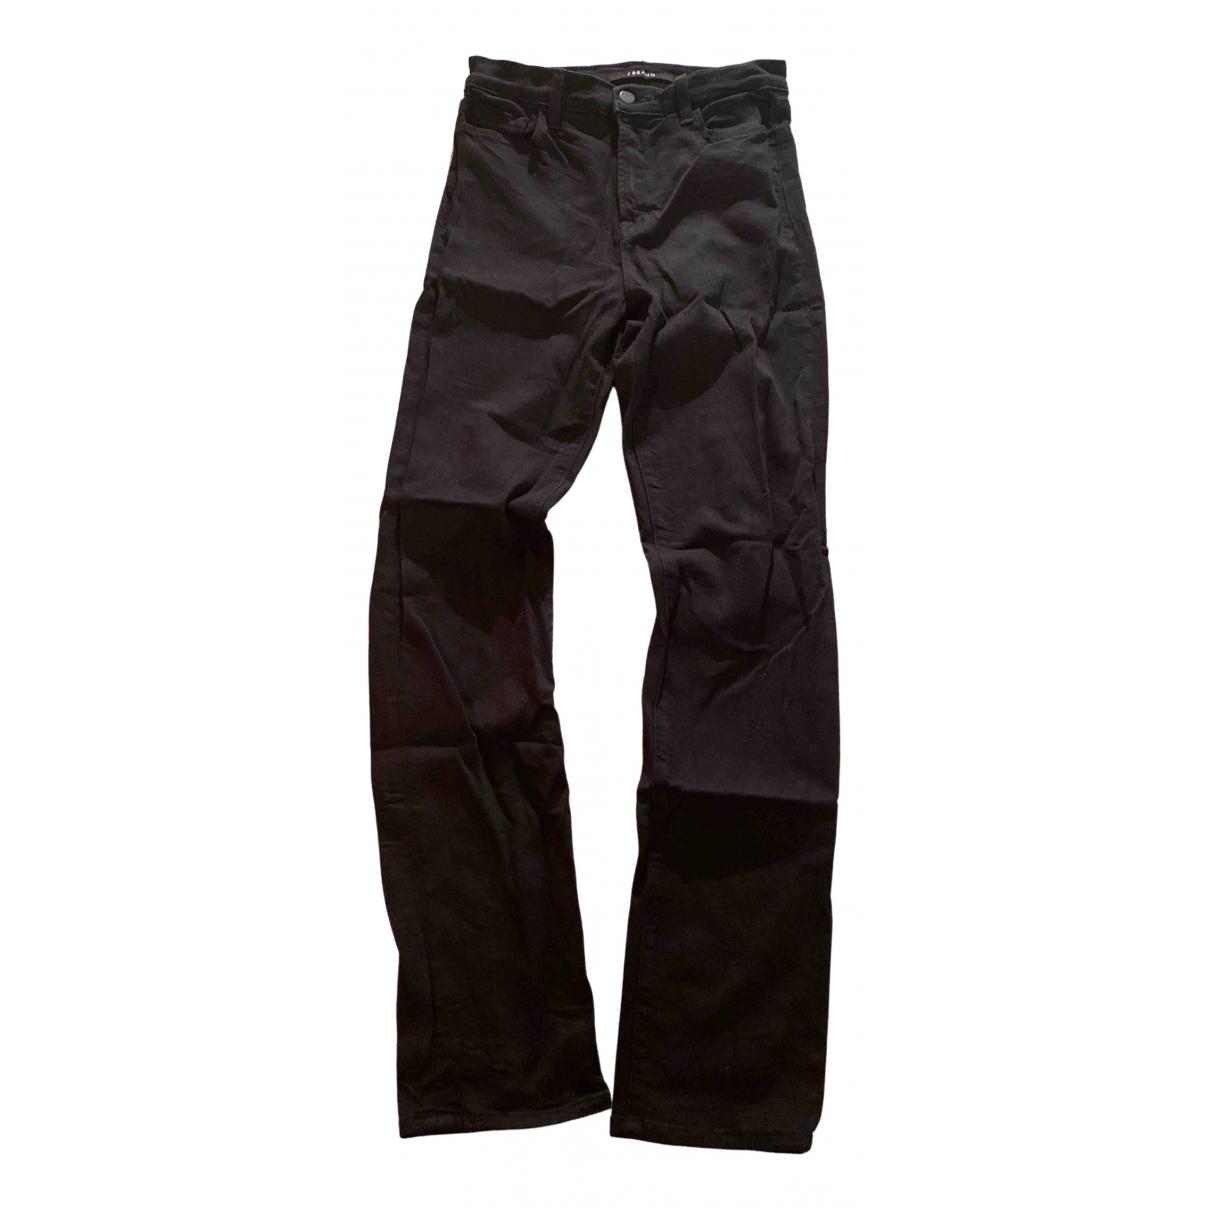 J Brand N Black Cotton - elasthane Jeans for Women 27 US